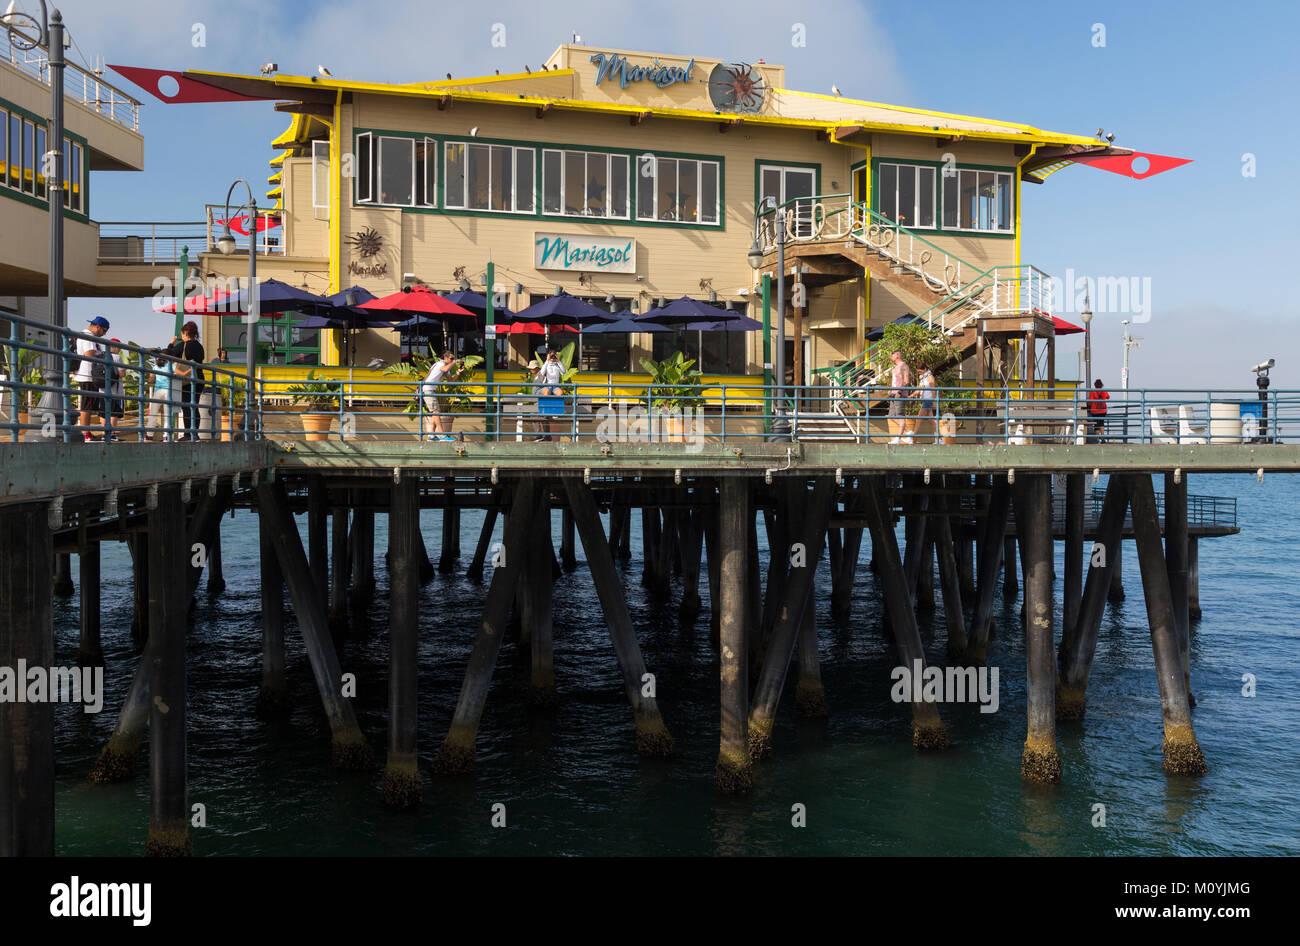 Mariasol Restaurant Santa Monica Pier California Stock Photo